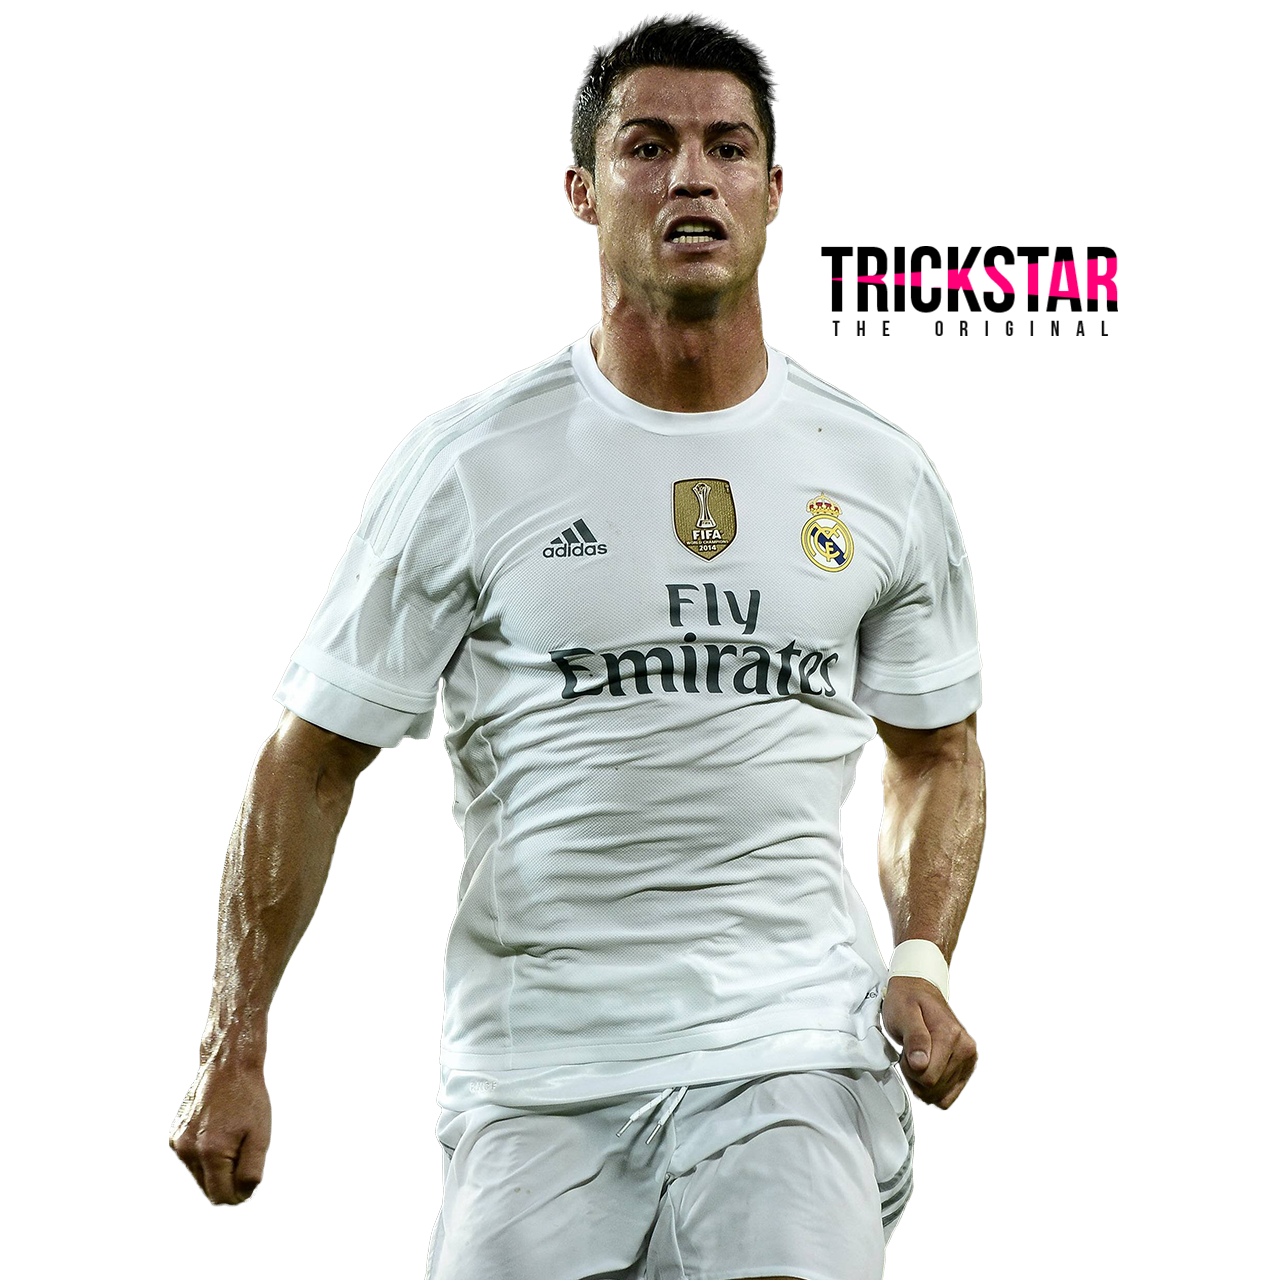 Cristiano Ronaldo Render 2015 2016 Real Madrid By El Kira On Deviantart